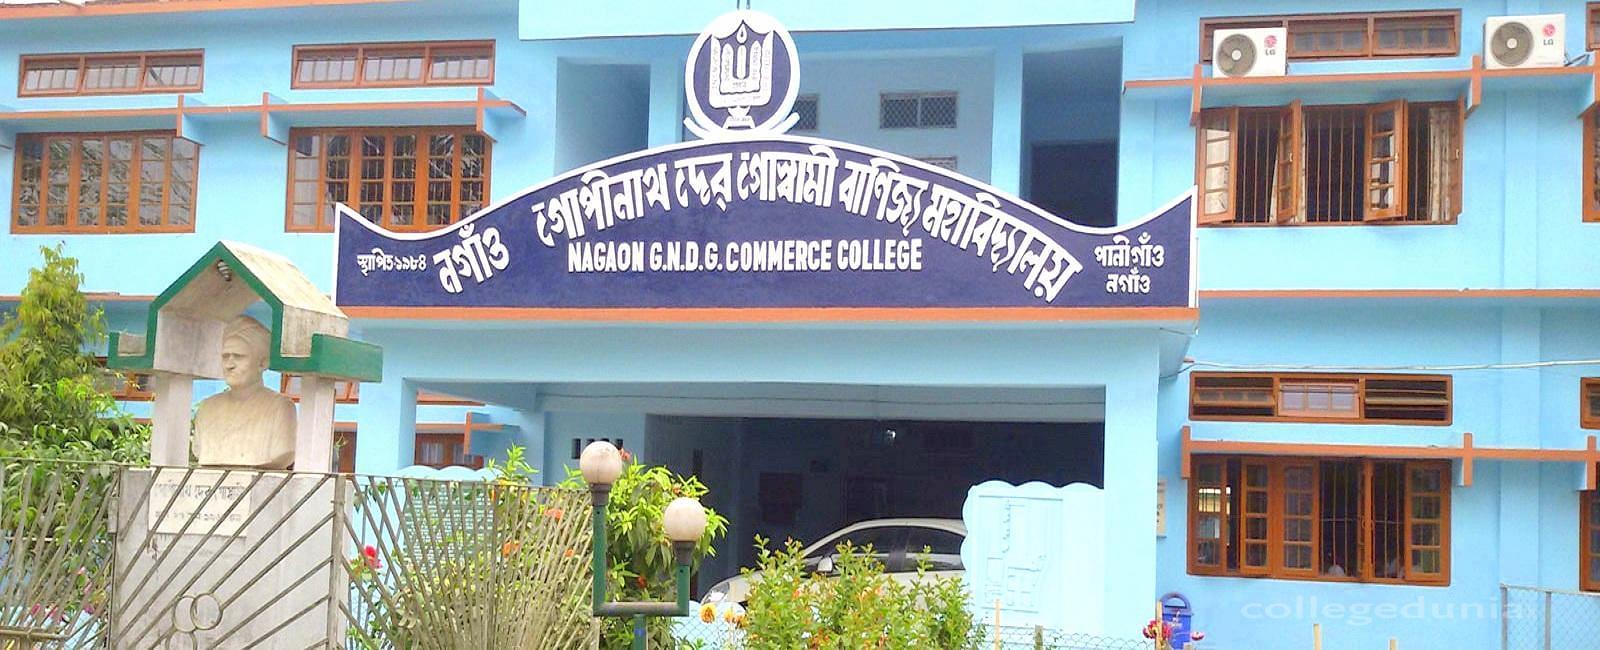 Nagaon GNDG Commerce College